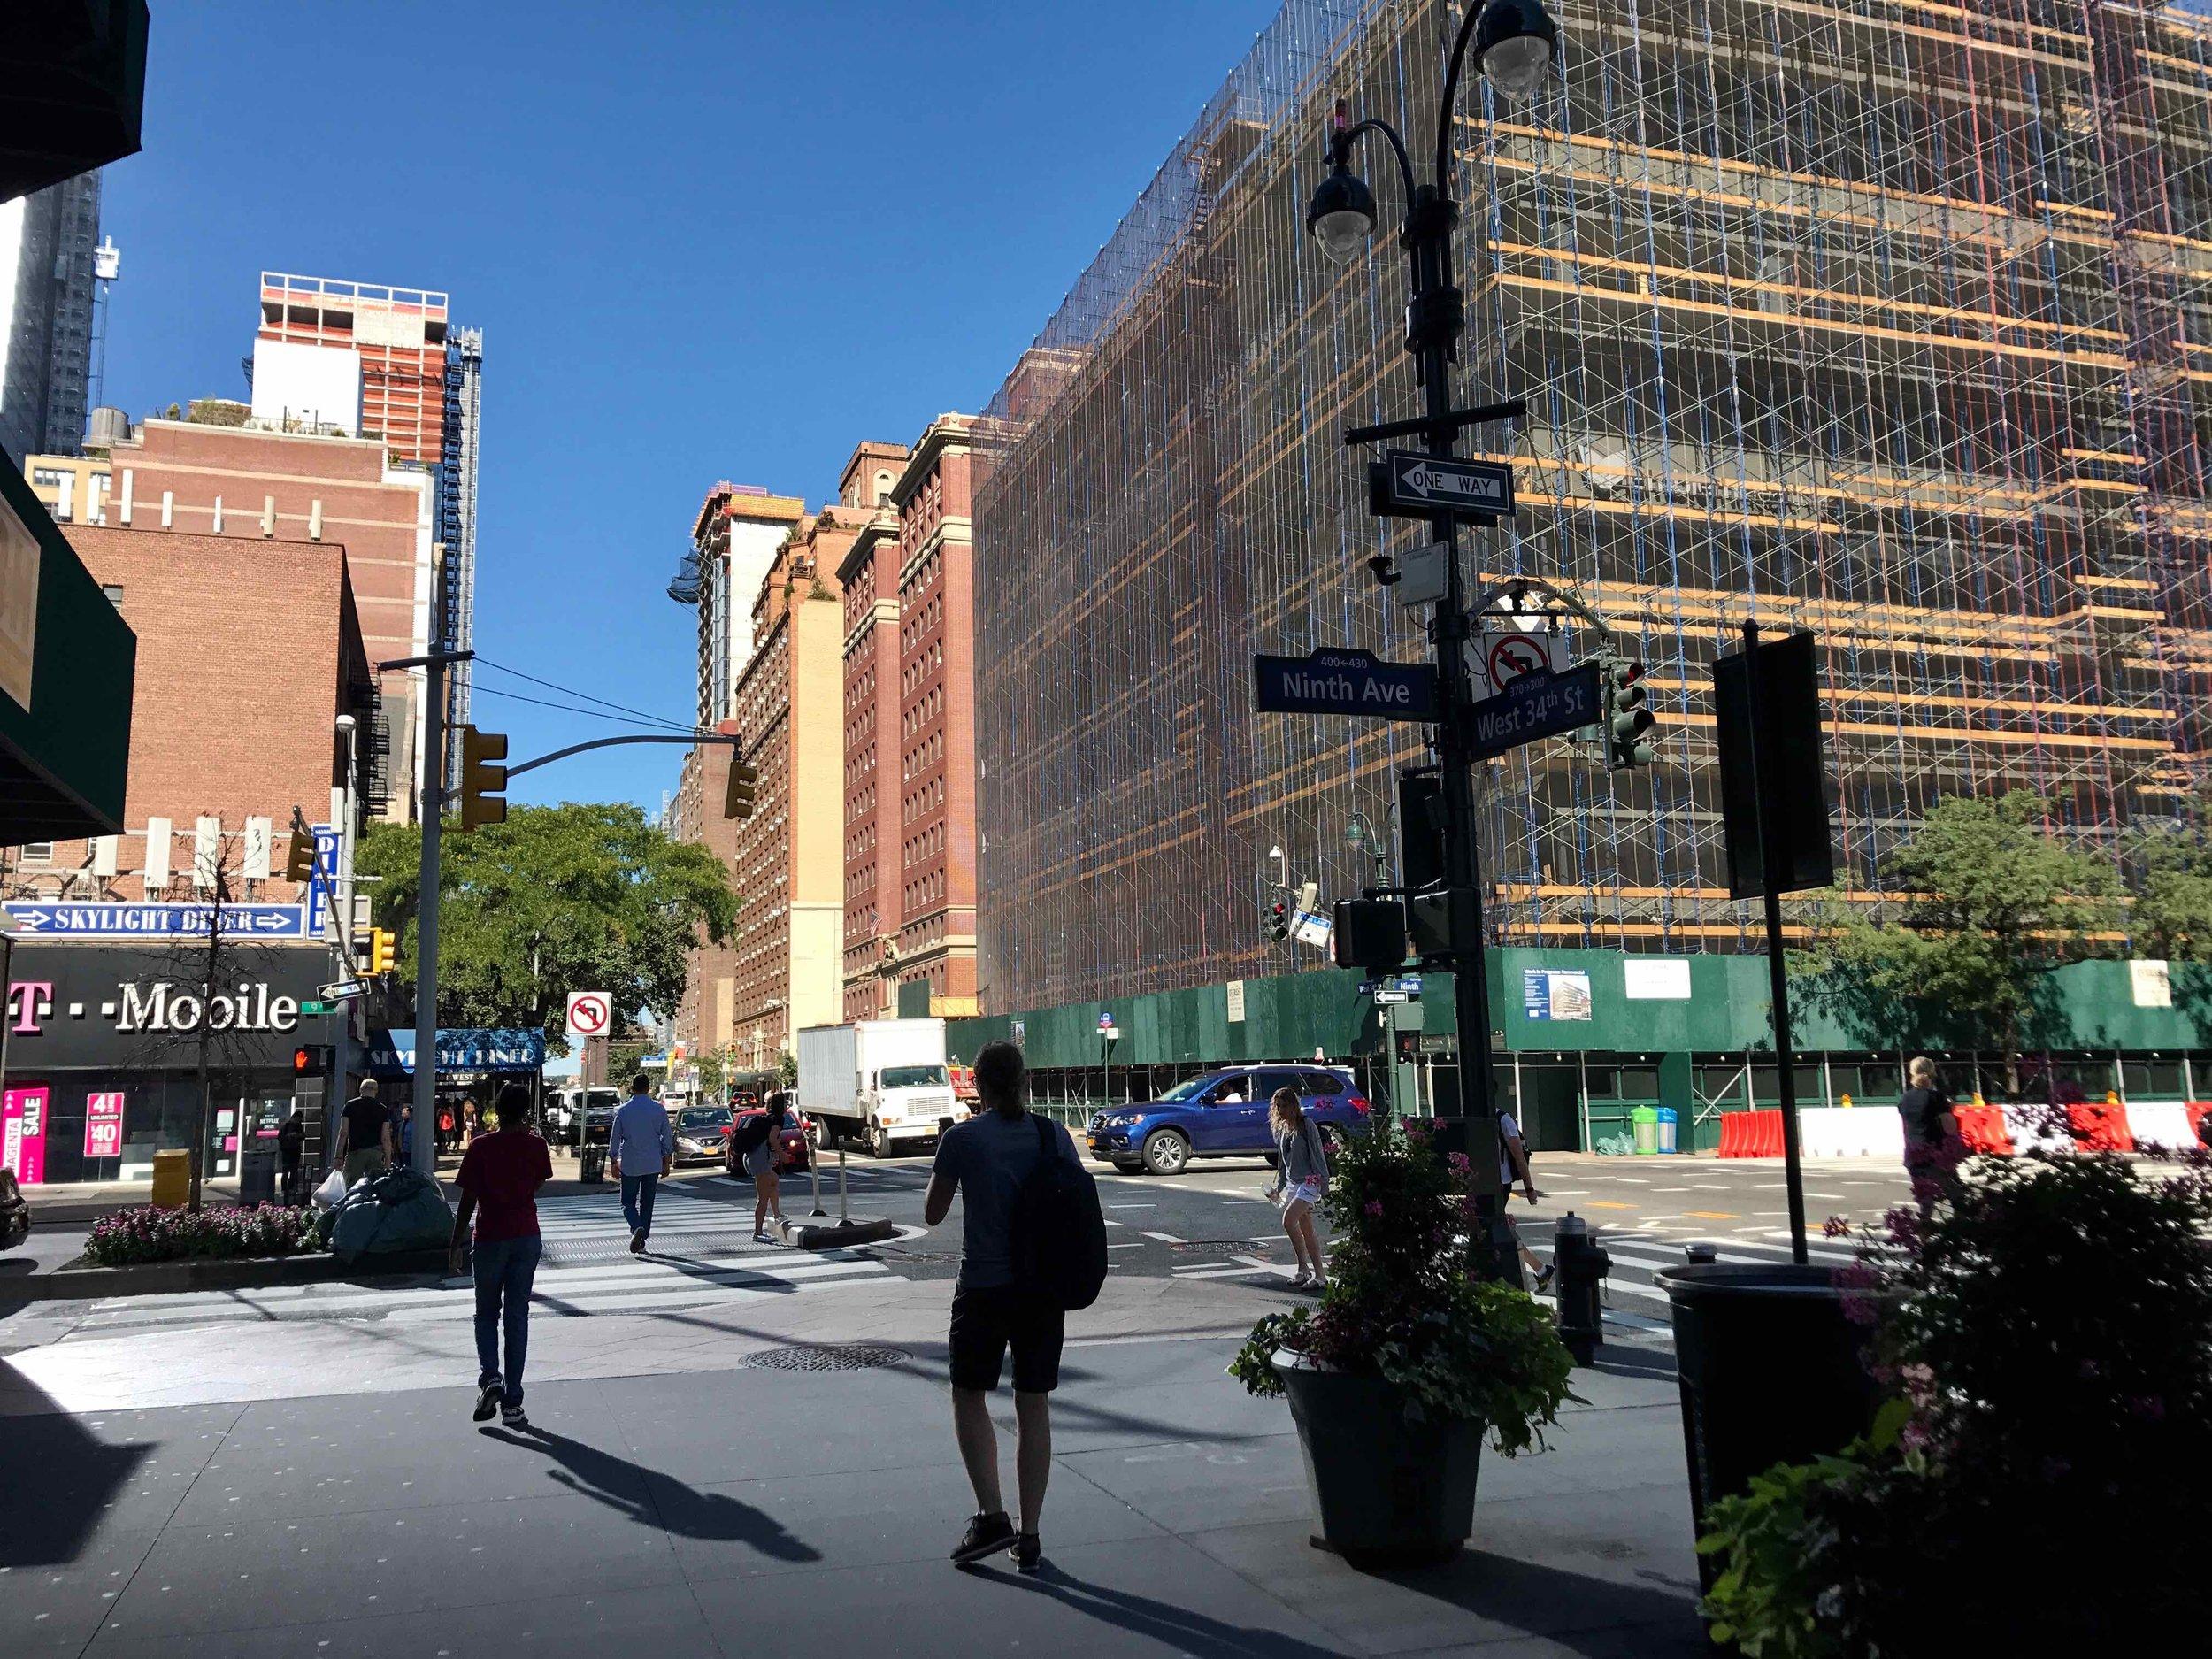 Ninth Avenue